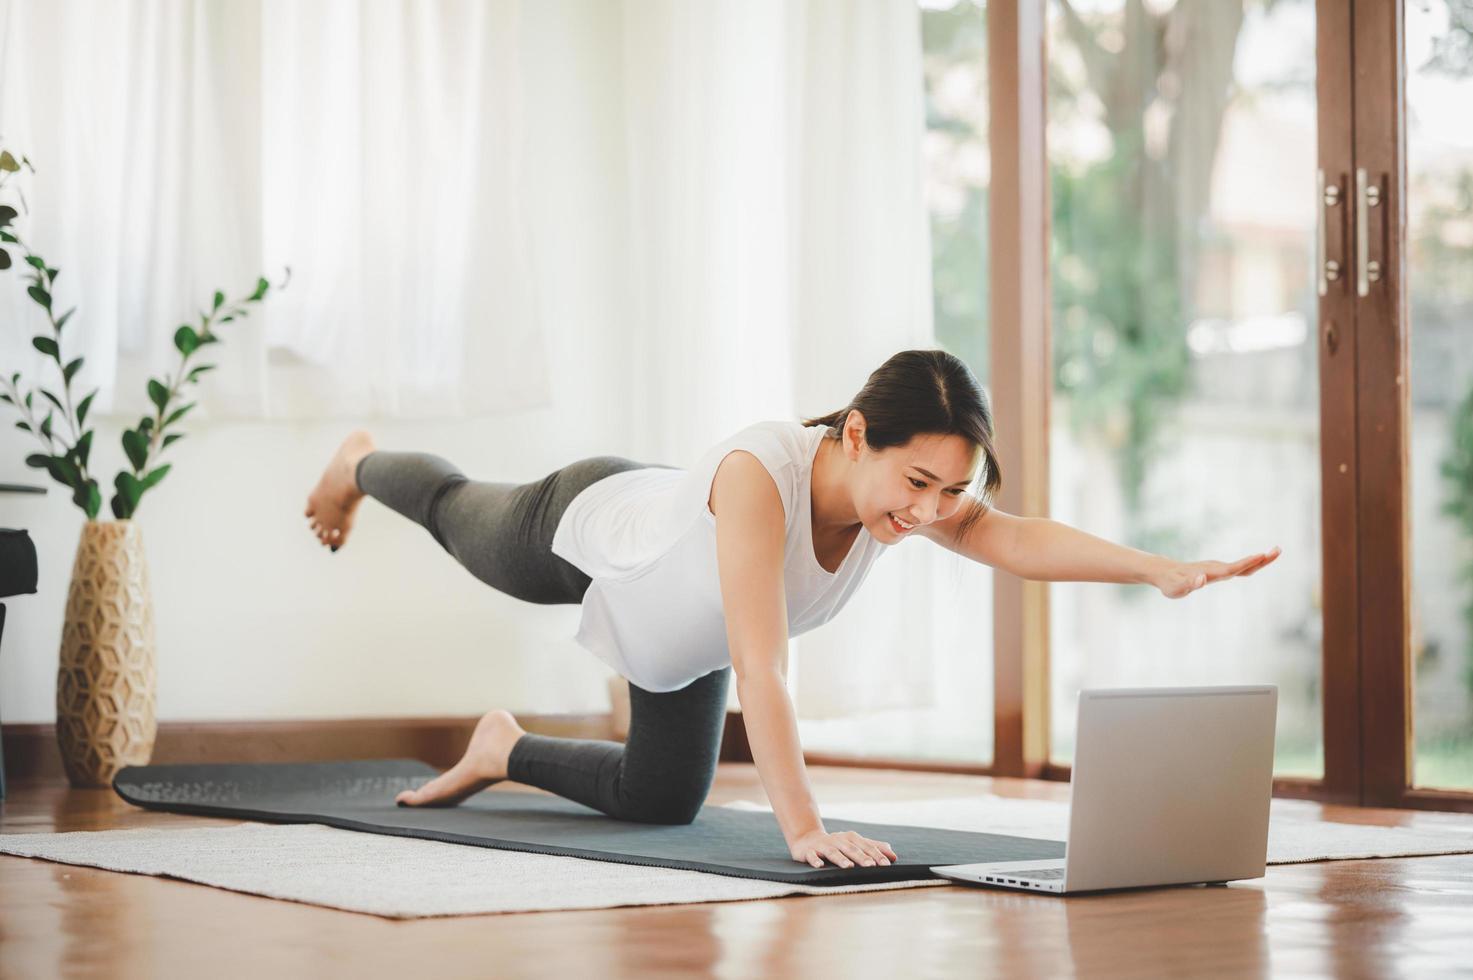 Frau, die virtuell zu Hause trainiert foto